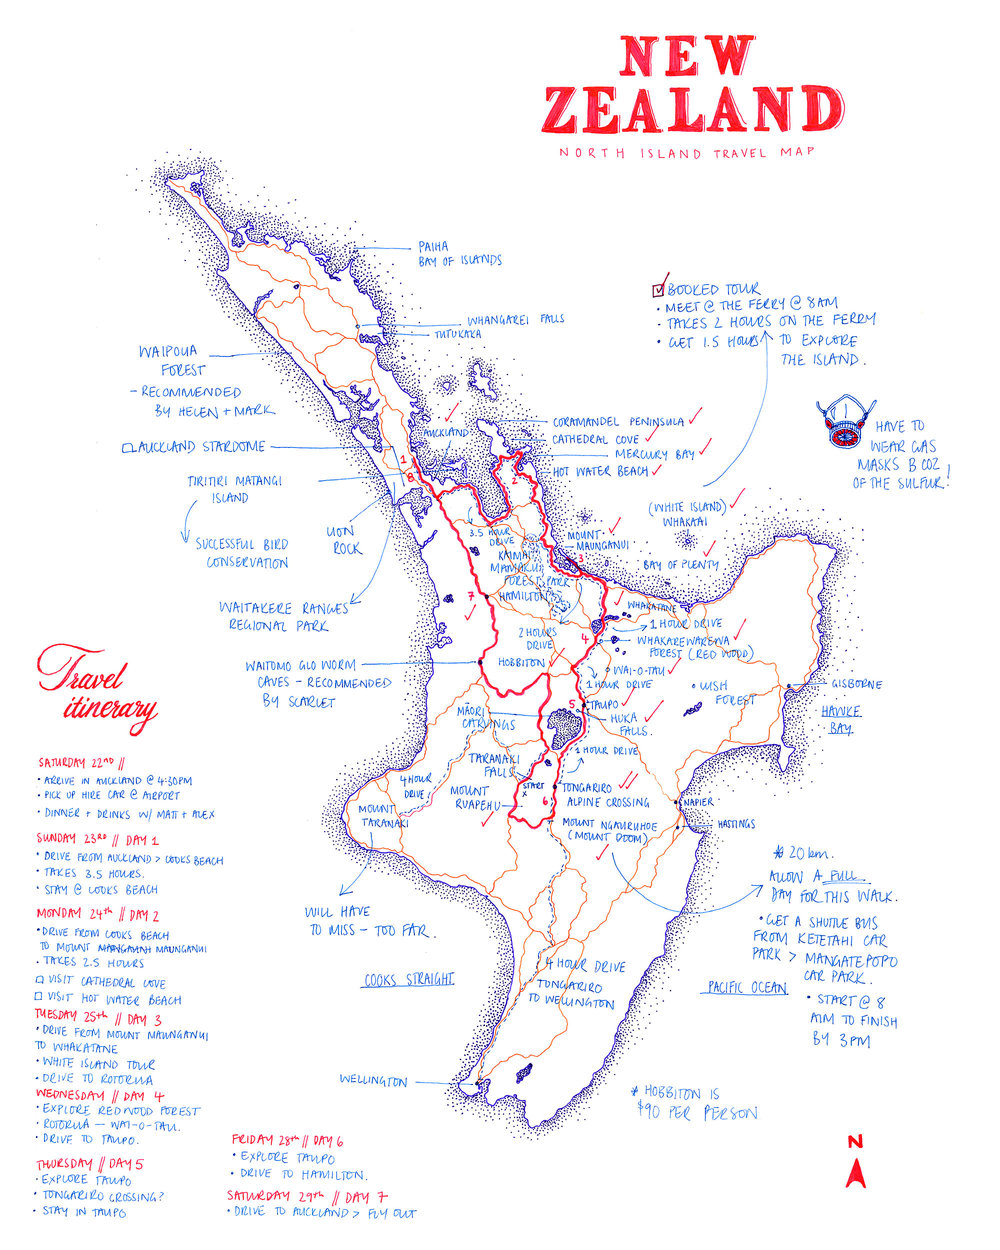 Peita-Blythe_NewZealand-Itinerary-Map_Web.jpg